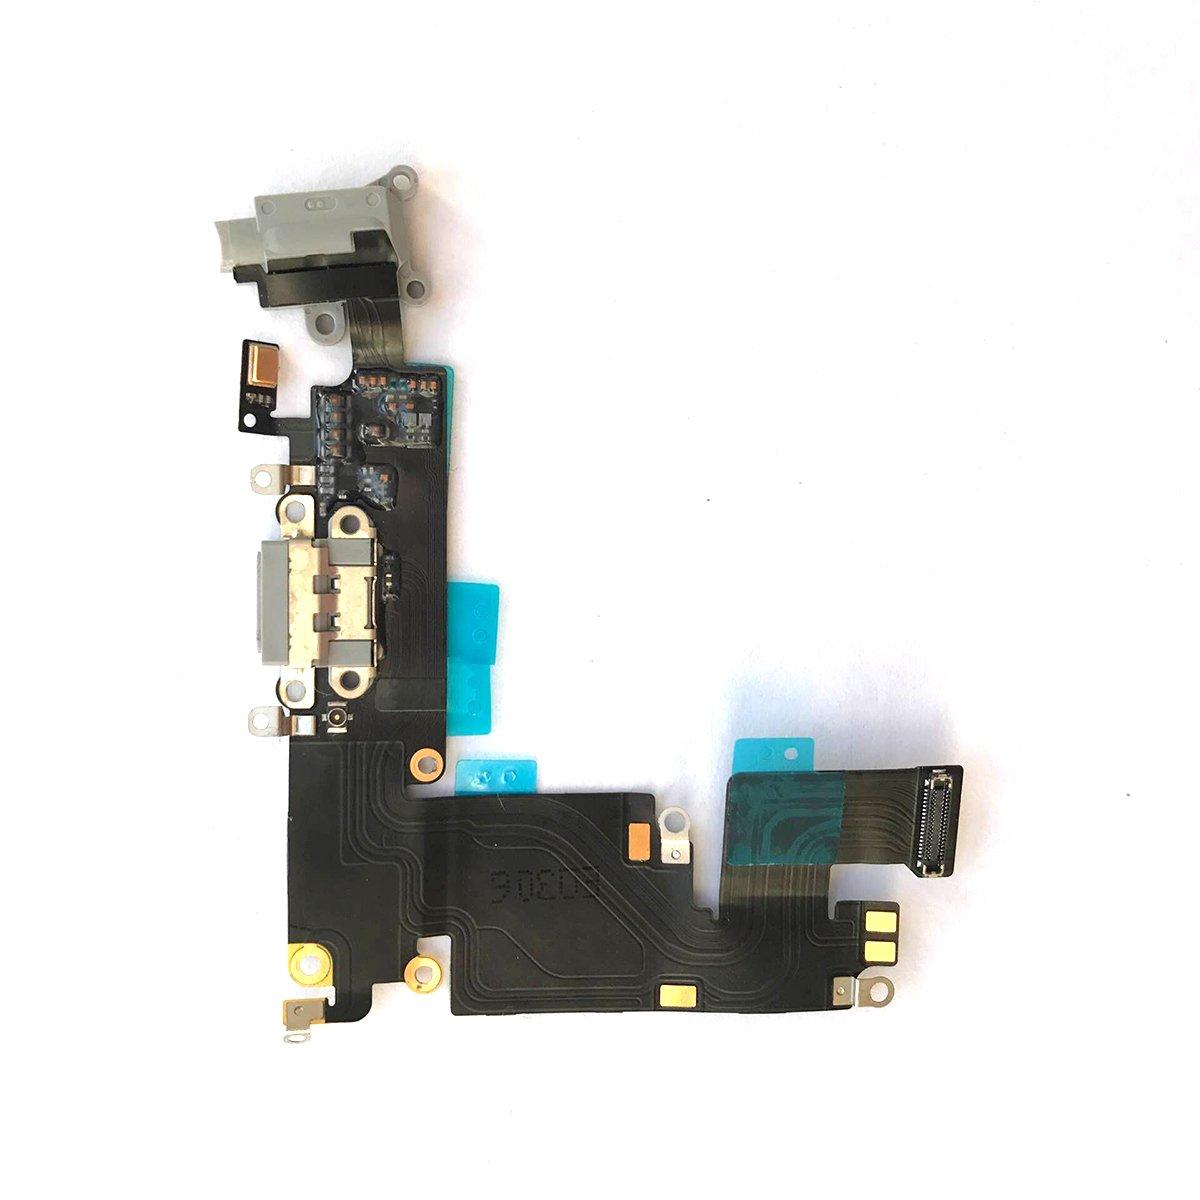 Puerto de Carga para iPhone 6 Plus 5.5 Dark Gray